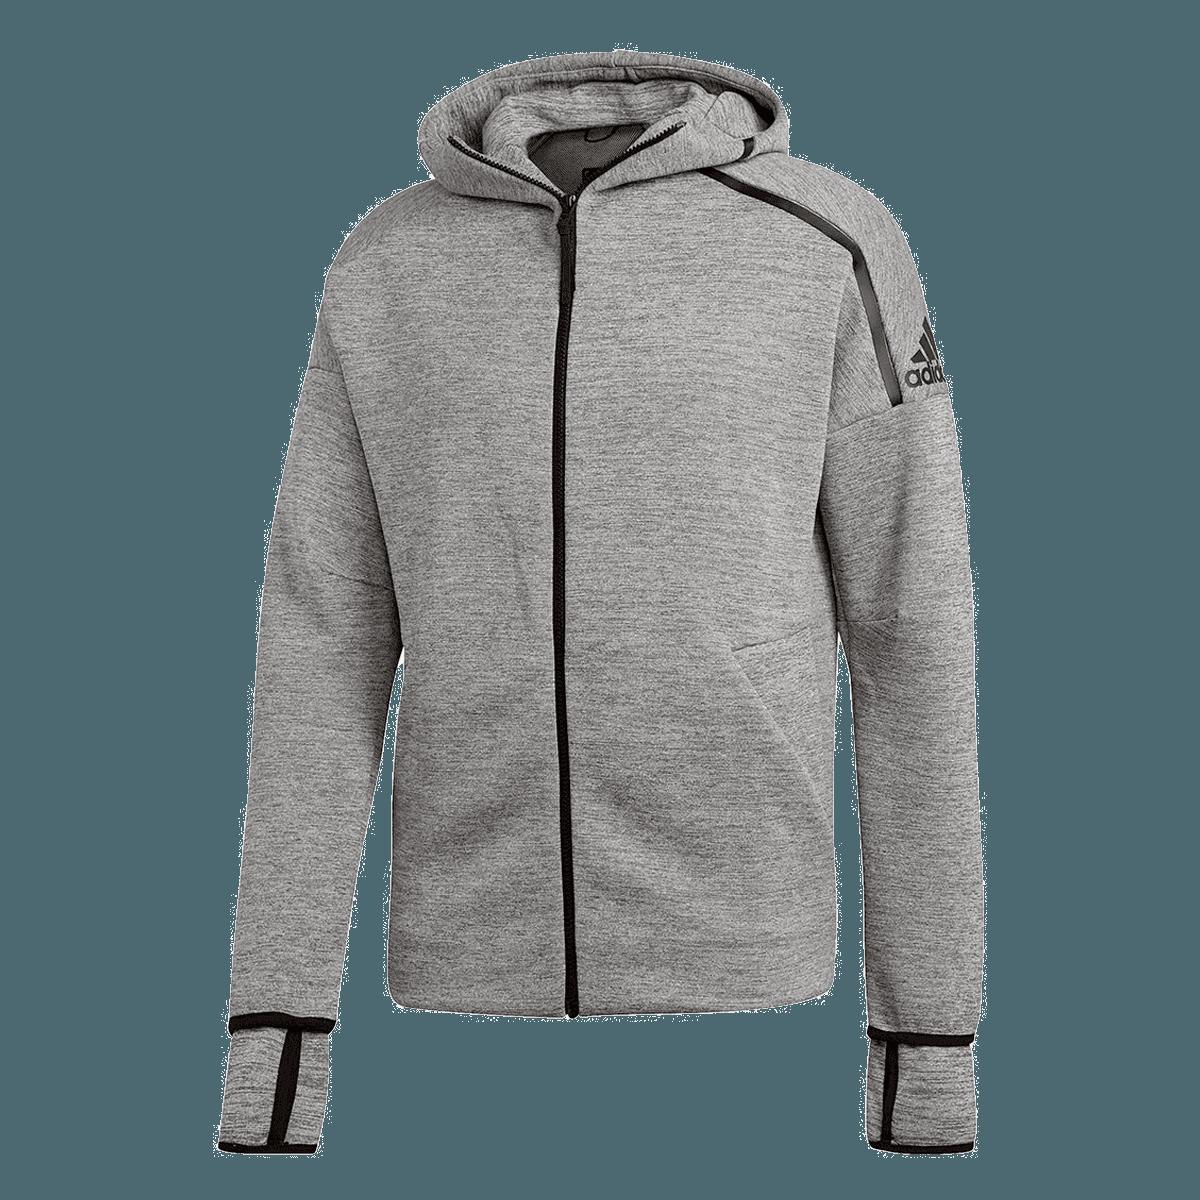 adidas Kapuzenjacke Z.N.E. Hoody Fast Release Zipper grauschwarz